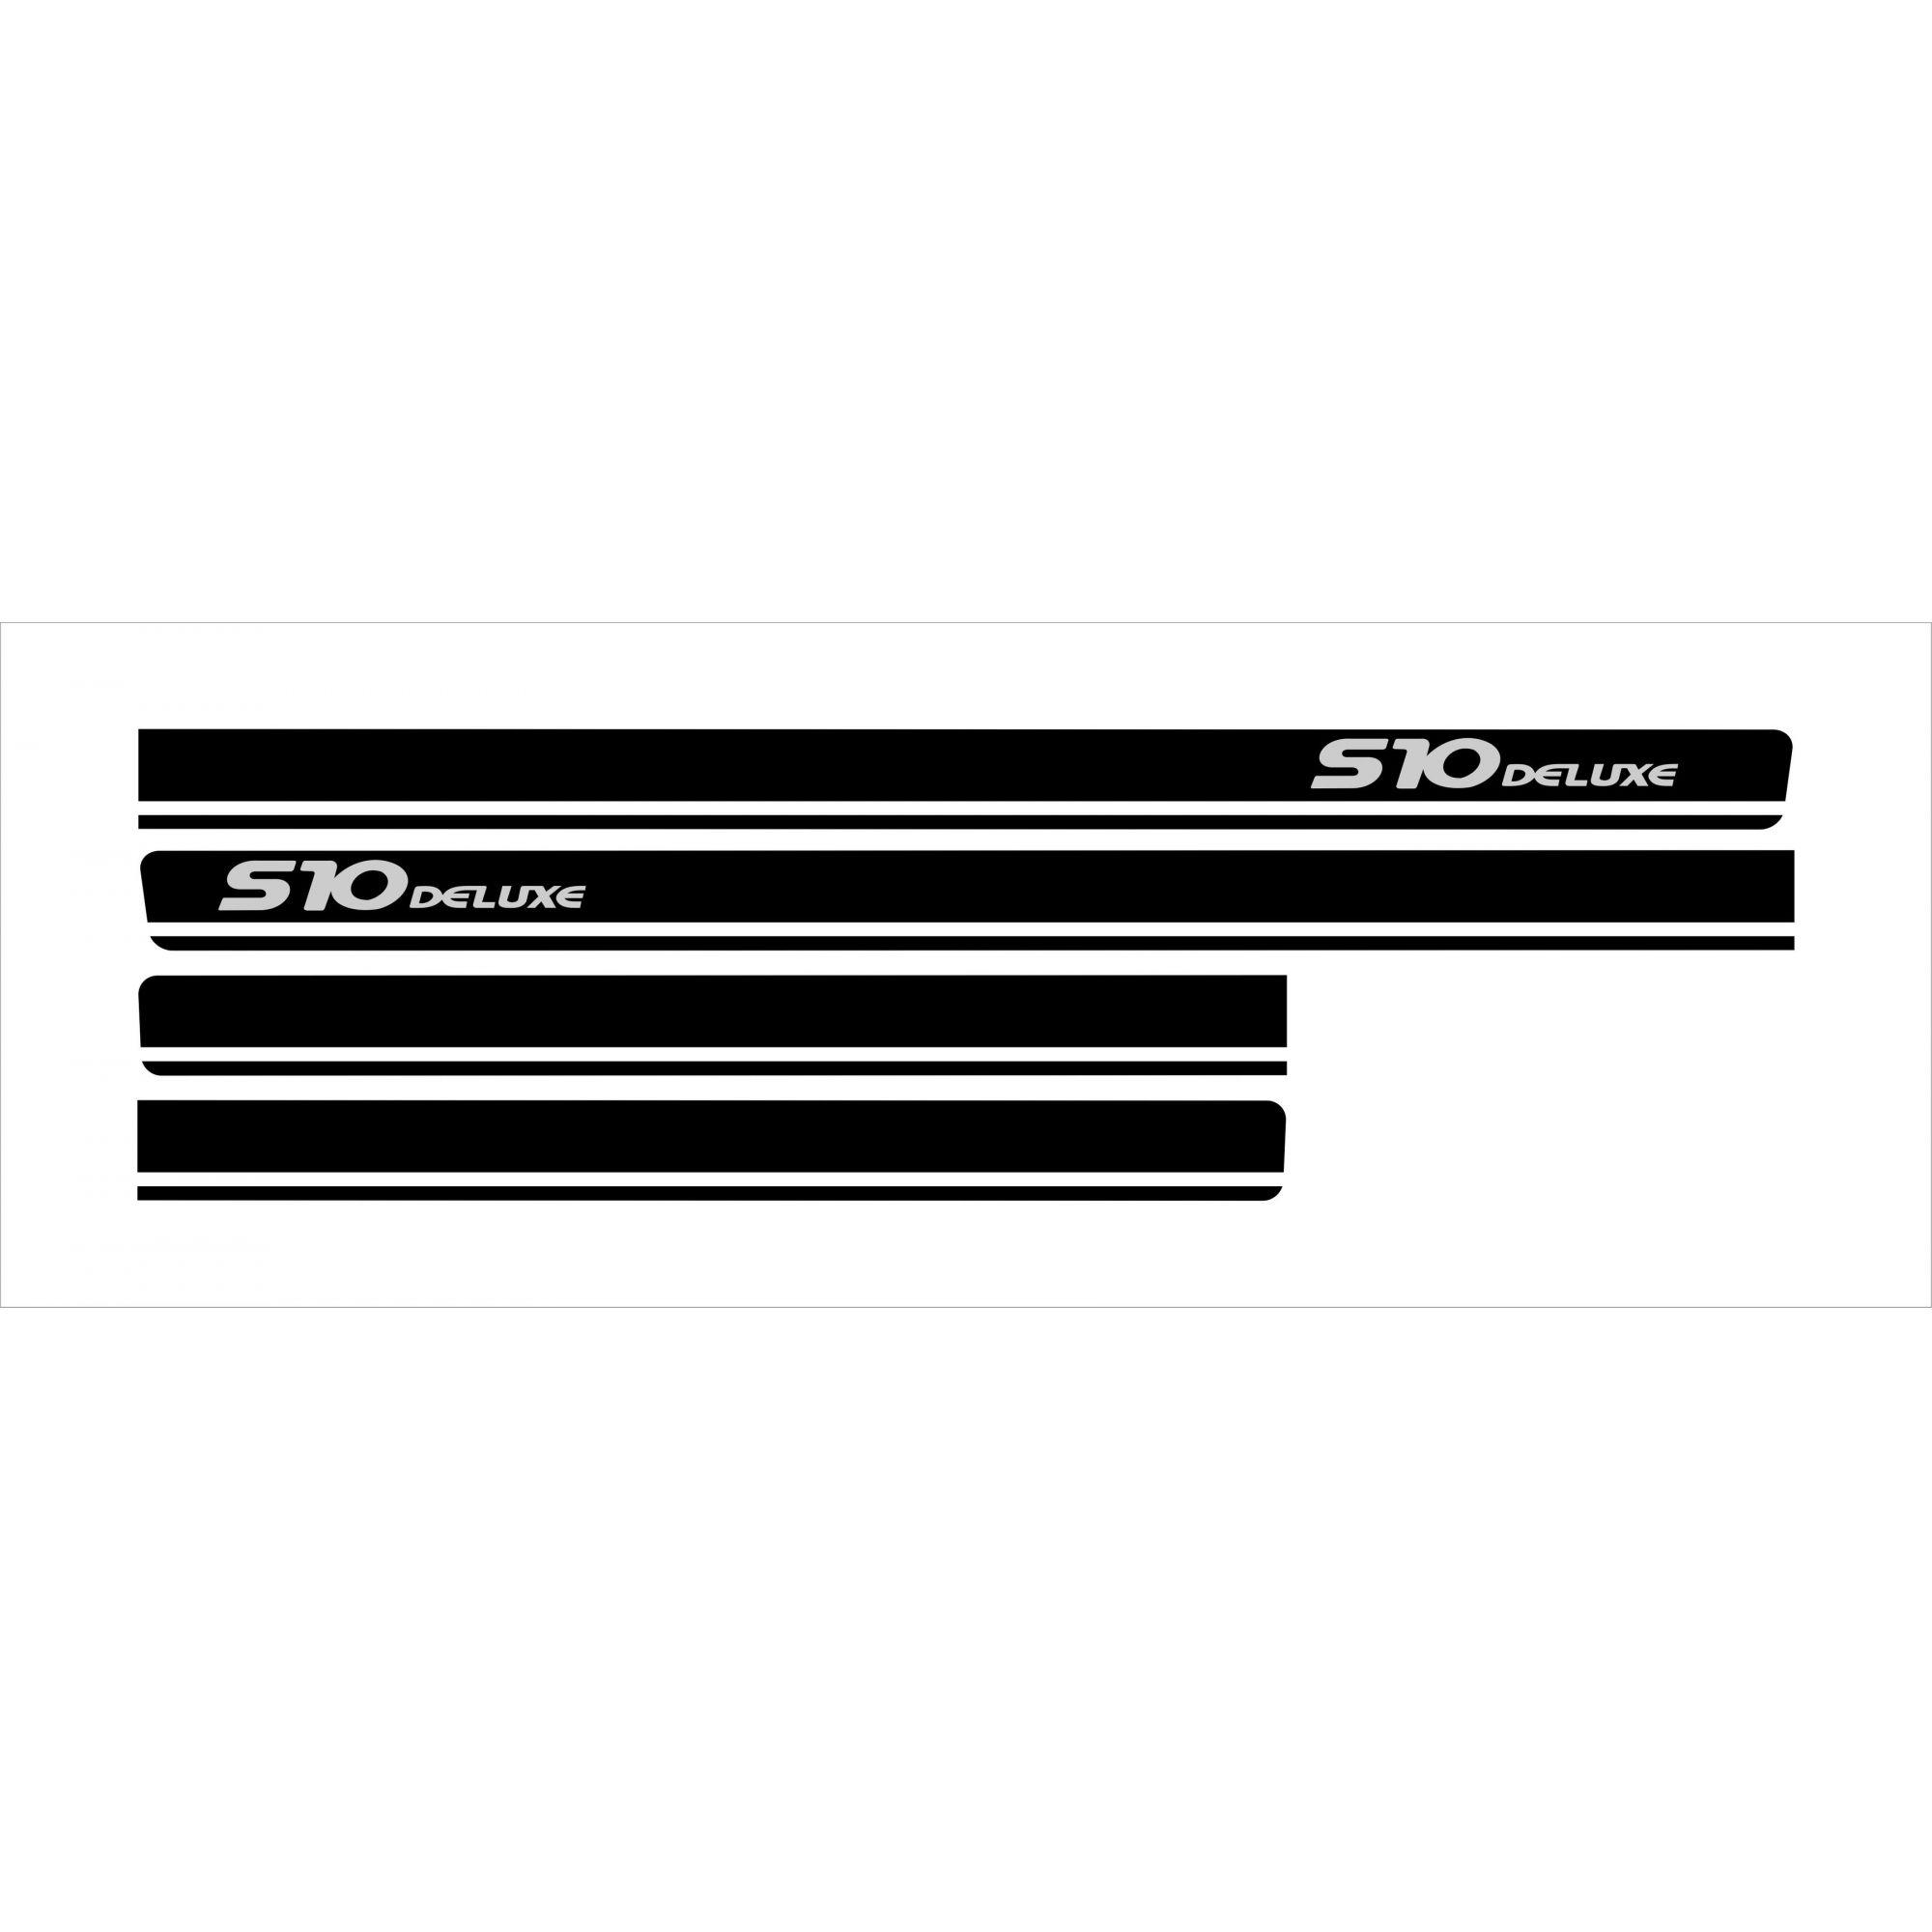 Adesivo Faixa Chevrolet S10 Deluxe Preto S10p11